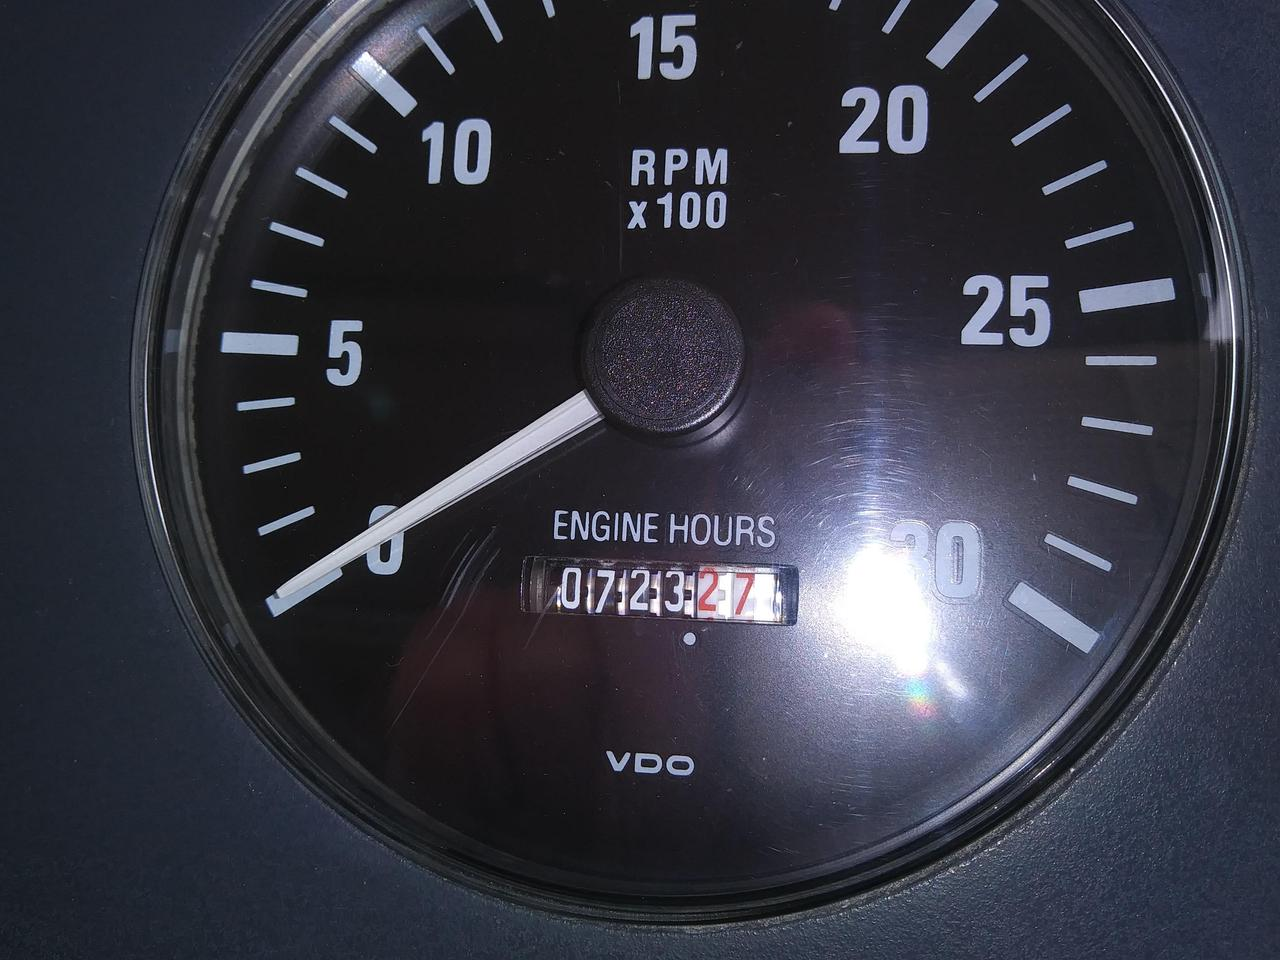 1994 Used Tiara 4000 Express Motor Yacht For Sale 149900 Port Vdo Engine Synchronizer Gauge Wiring Diagram